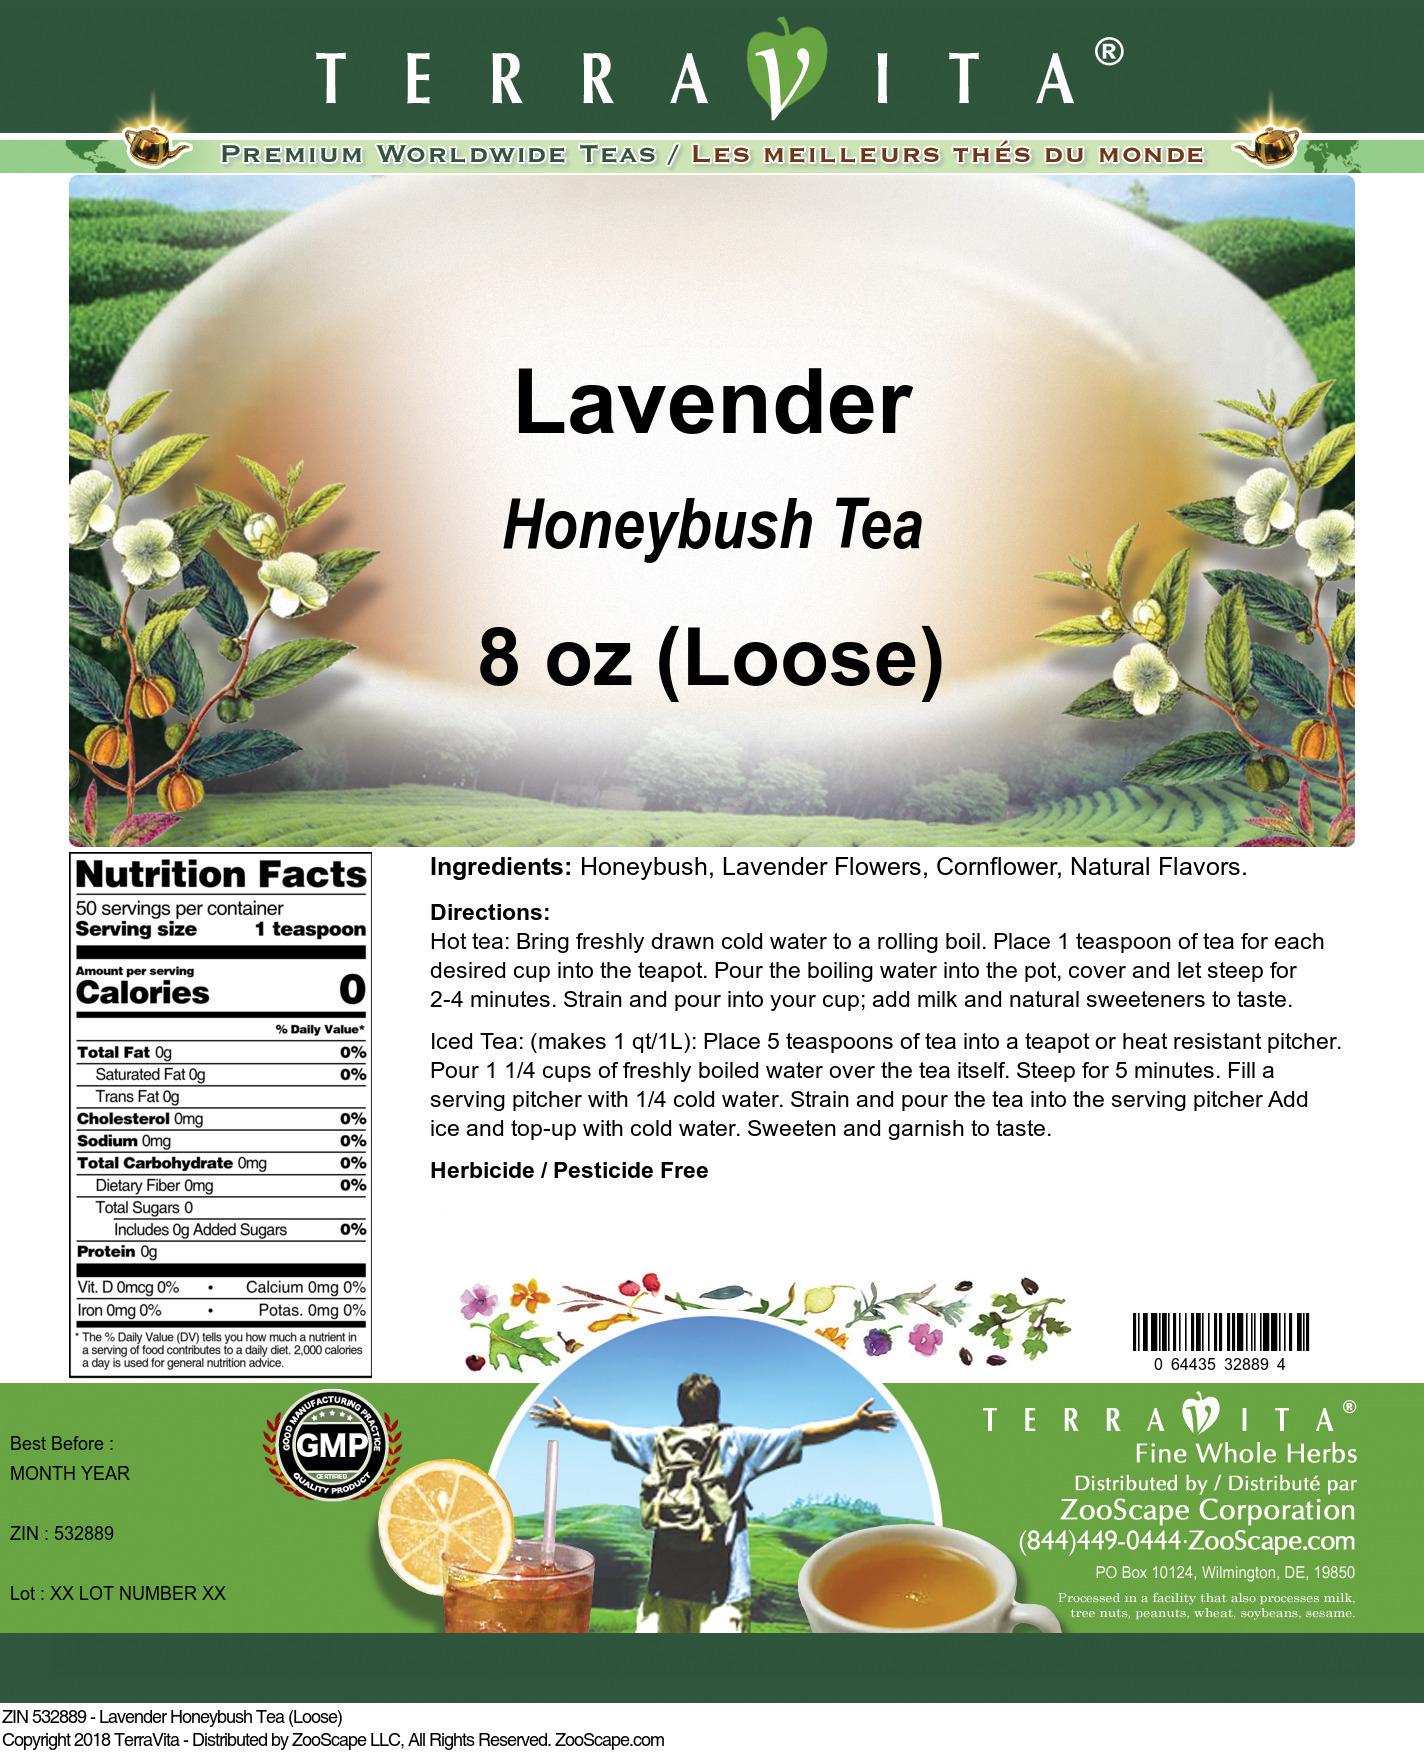 Lavender Honeybush Tea (Loose)